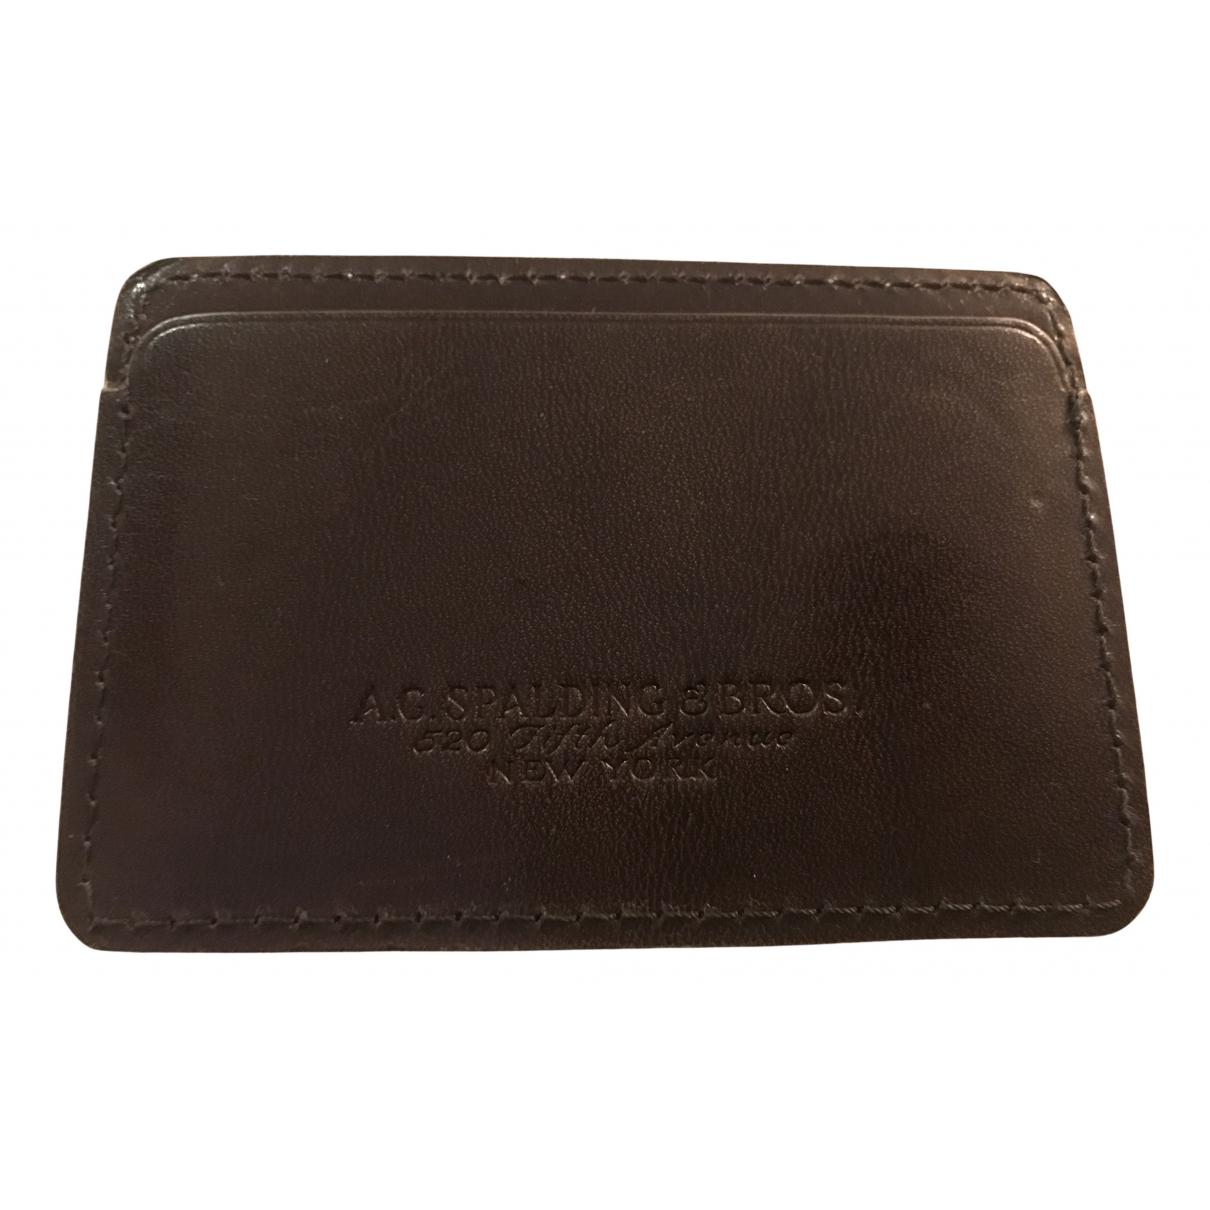 Ag Spalding & Bros N Brown Leather Small bag, wallet & cases for Men N